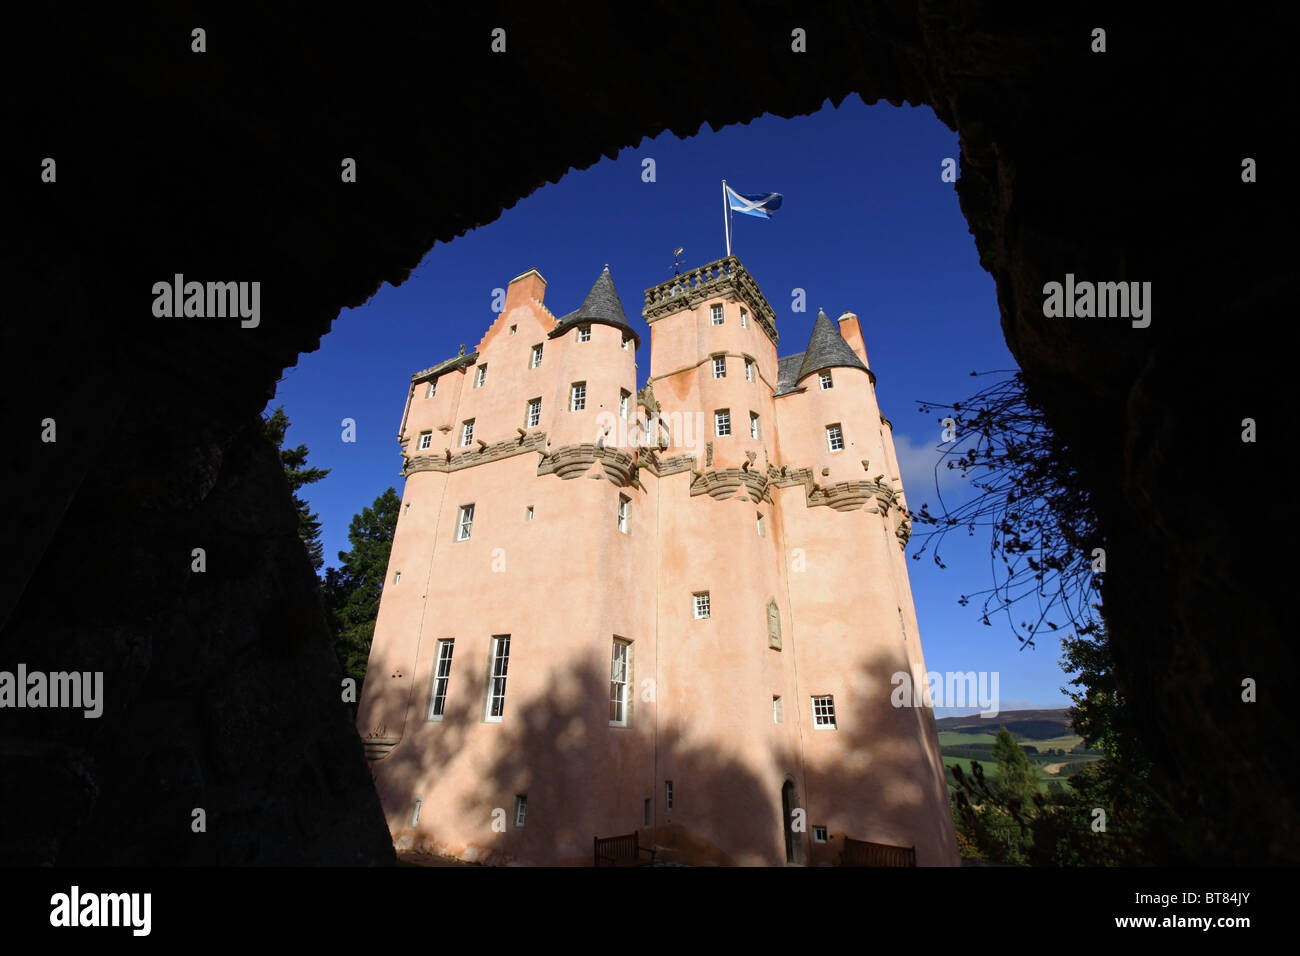 Newly refurbished Craigievar Castle near Alford, Aberdeenshire, Scotland, UK - Stock Image